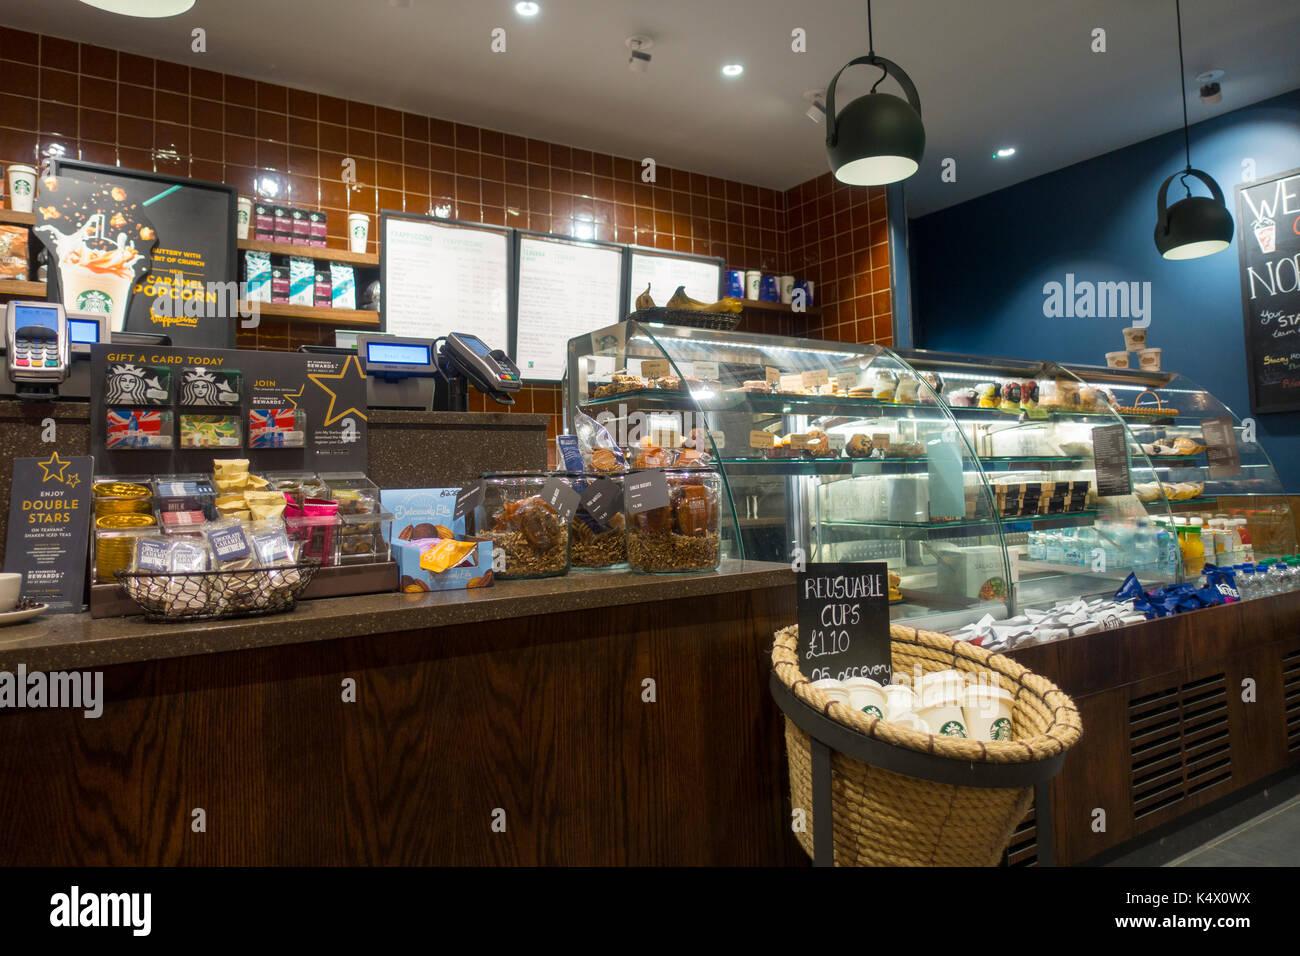 Paris Pastries Bakery Cafe Application